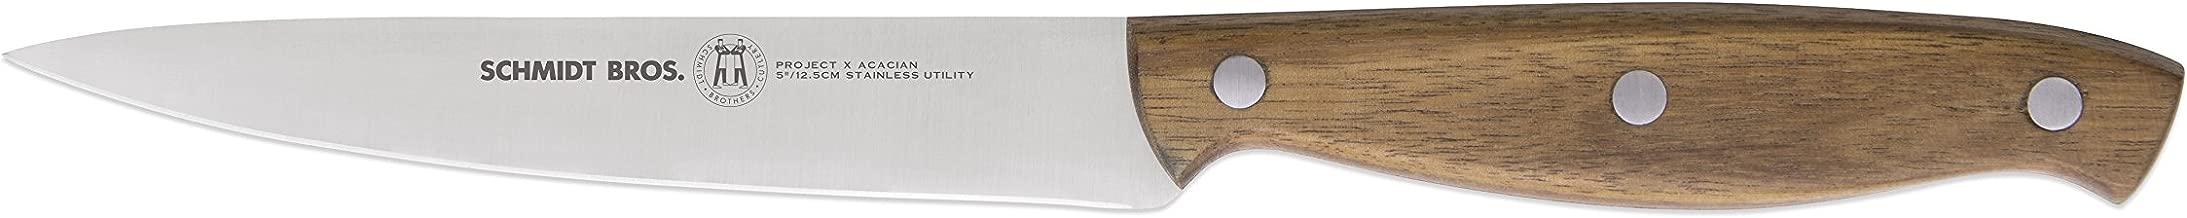 Schmidt Brothers Cutlery Project X / Acacian ユーティリティ(刃渡り約12.5cm)<正規品>